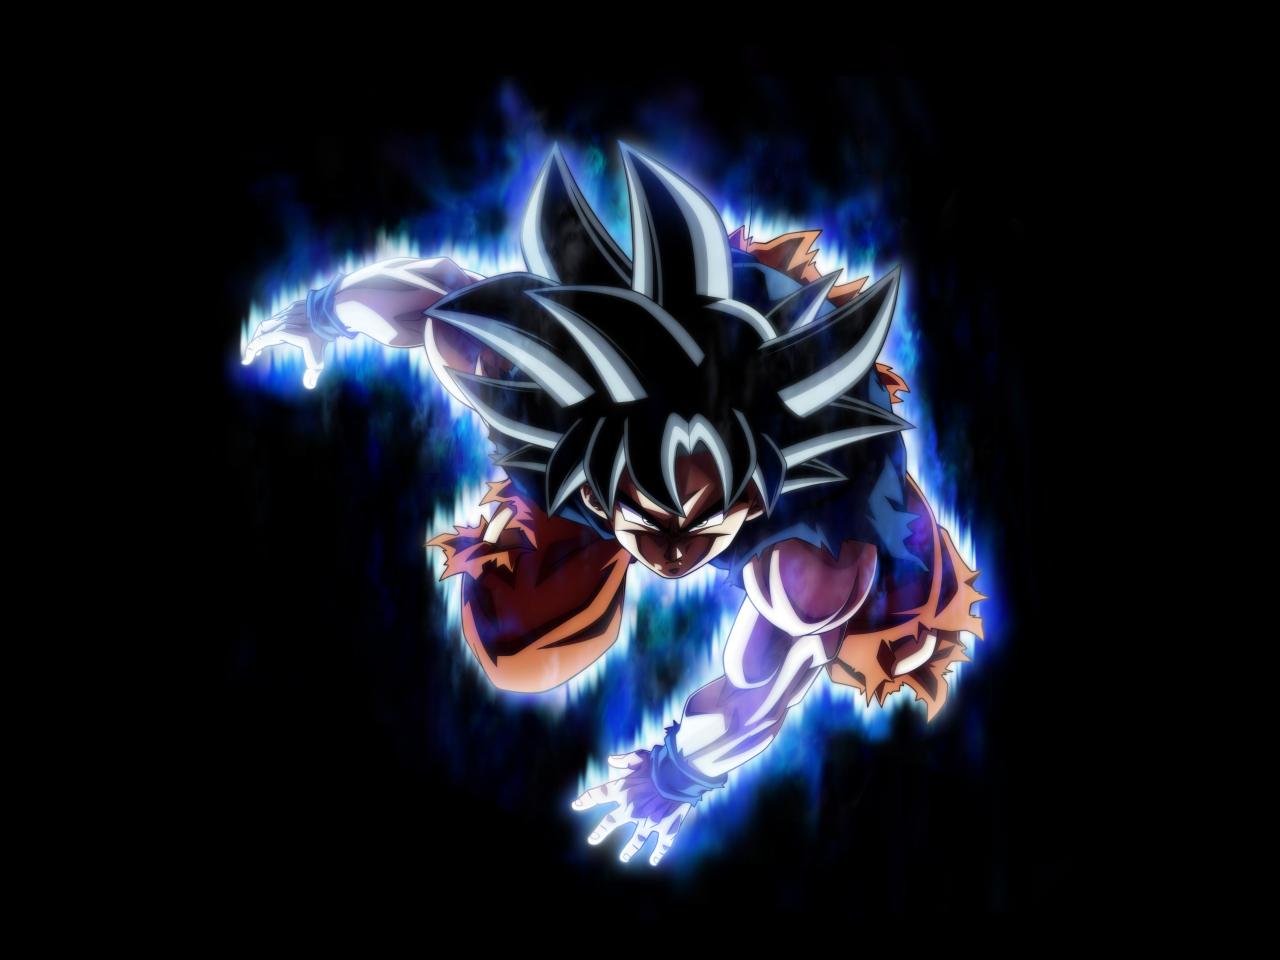 Dragon ball super, Super Saiyan, goku, 1280x960 wallpaper